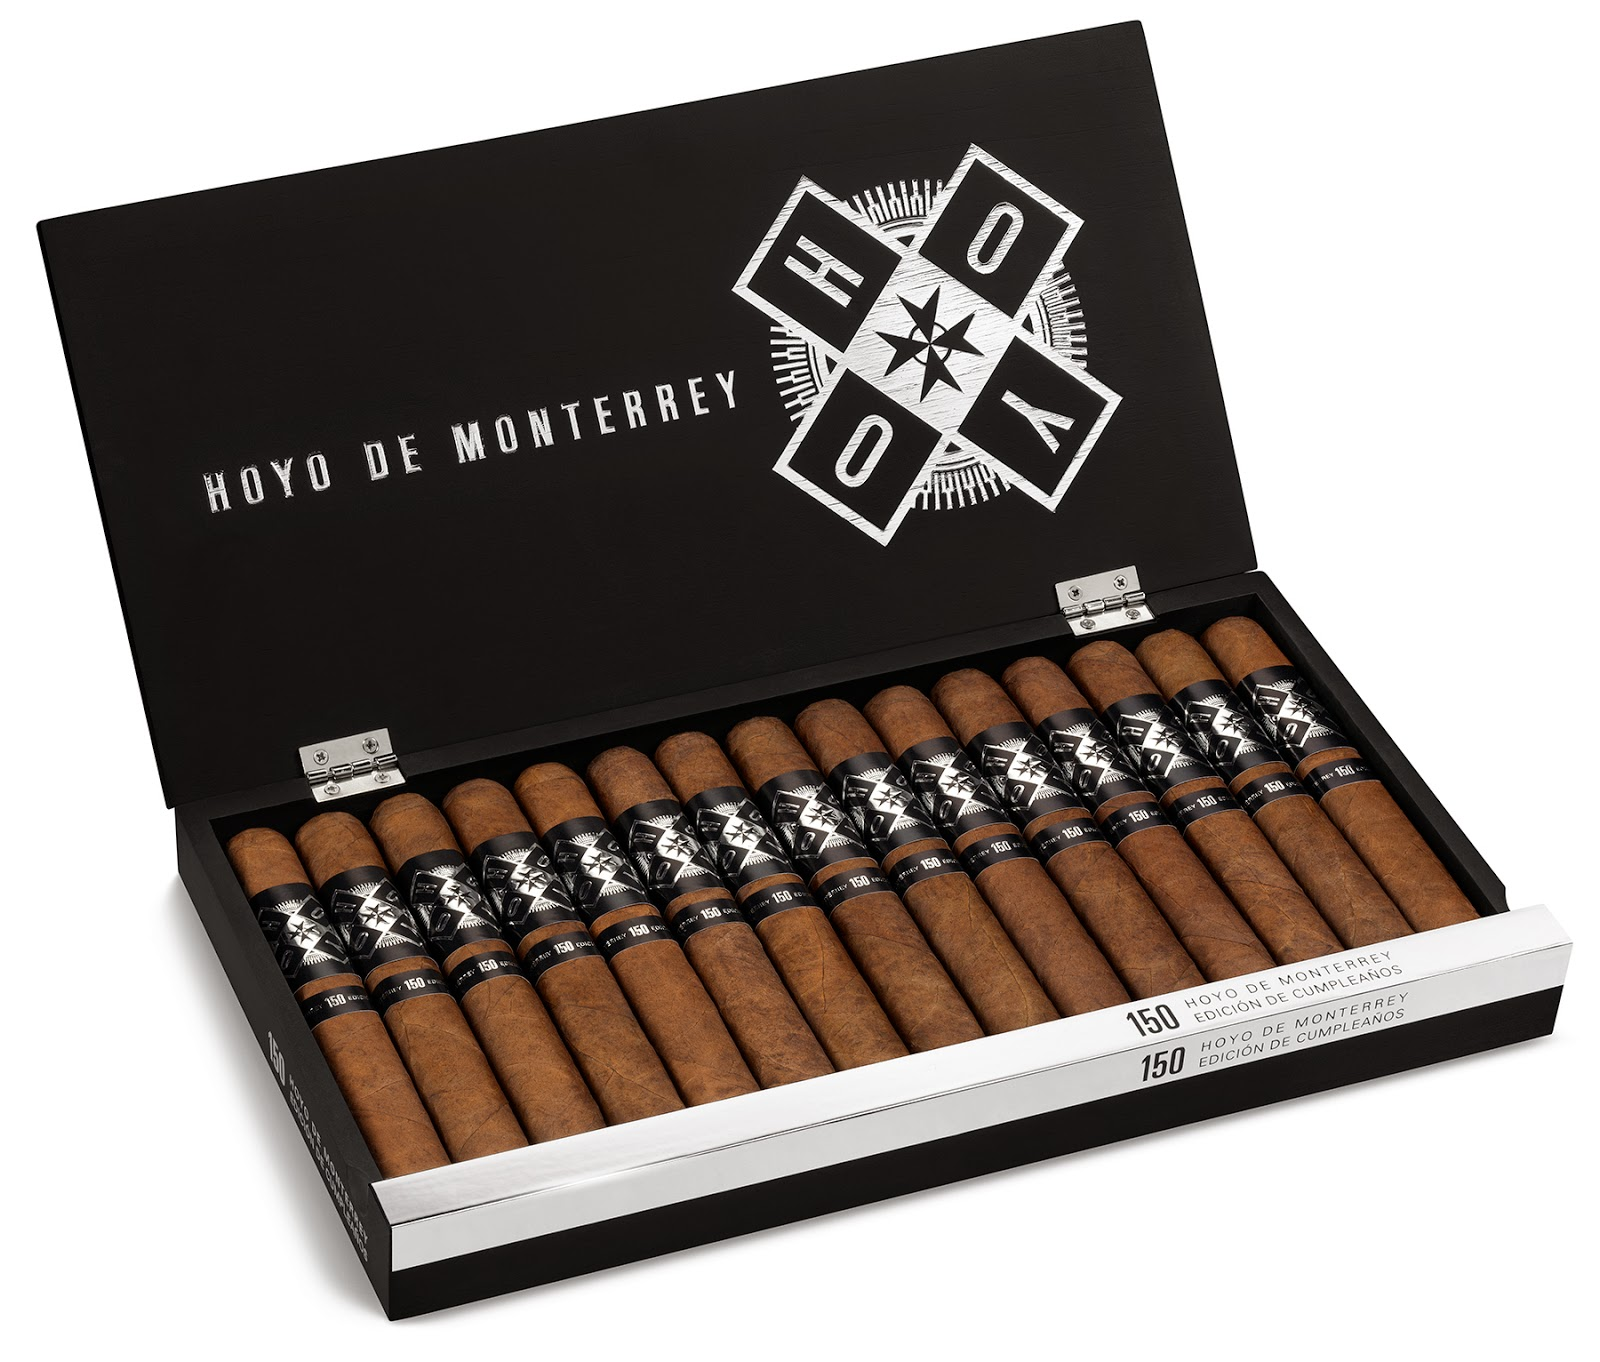 Hoyo_de_Monterrey_Edicion_de_Cumpleanos_1501